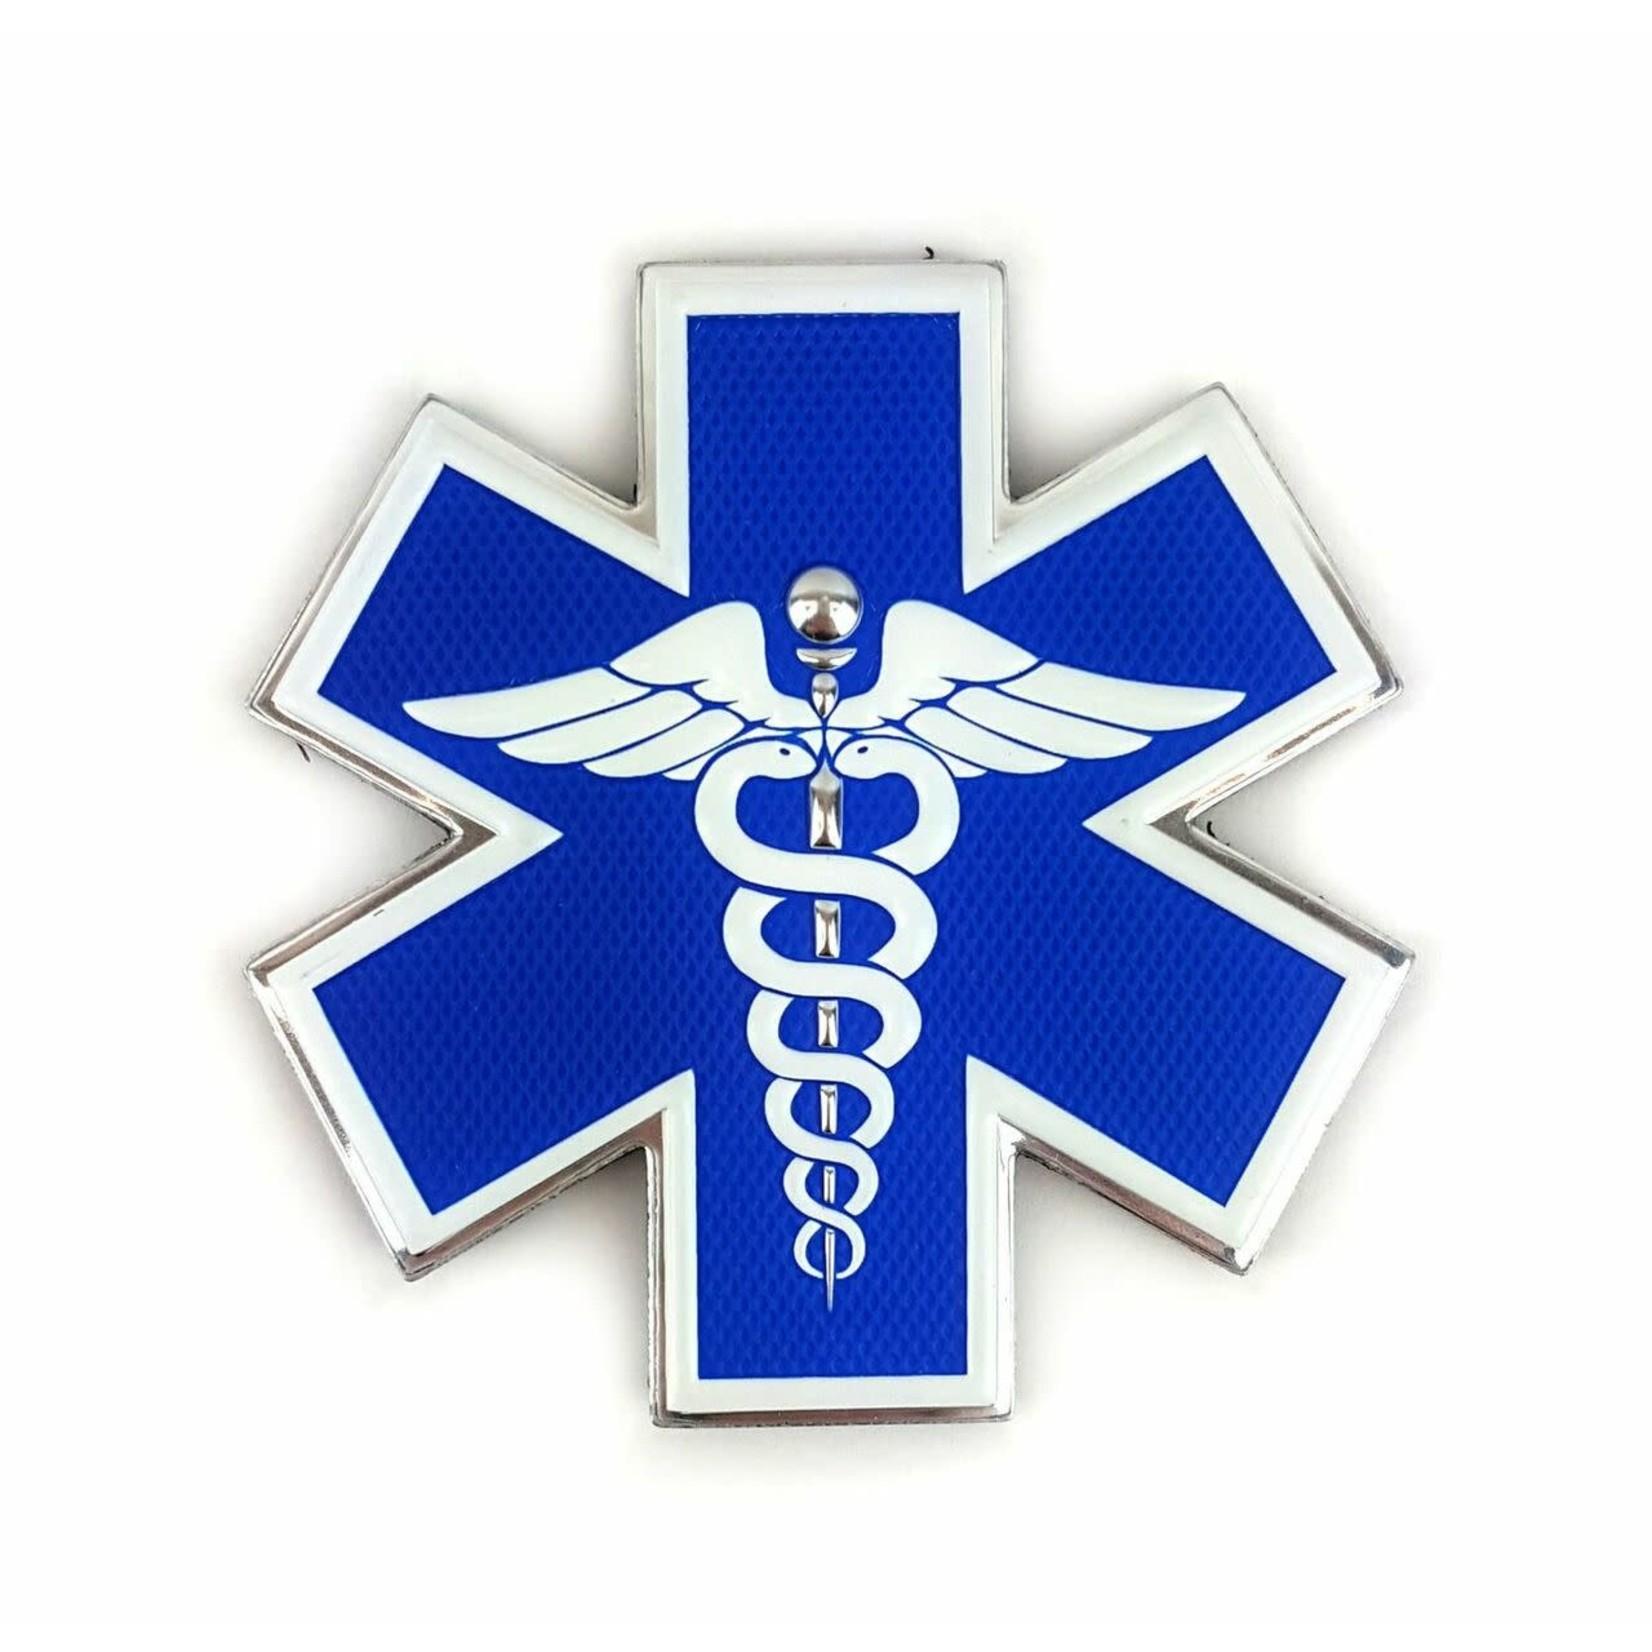 Klarus Tactical Innovations Chrome Morale Patch -Medical Responder - Star Of Life Dual Snake - Chrome Trim